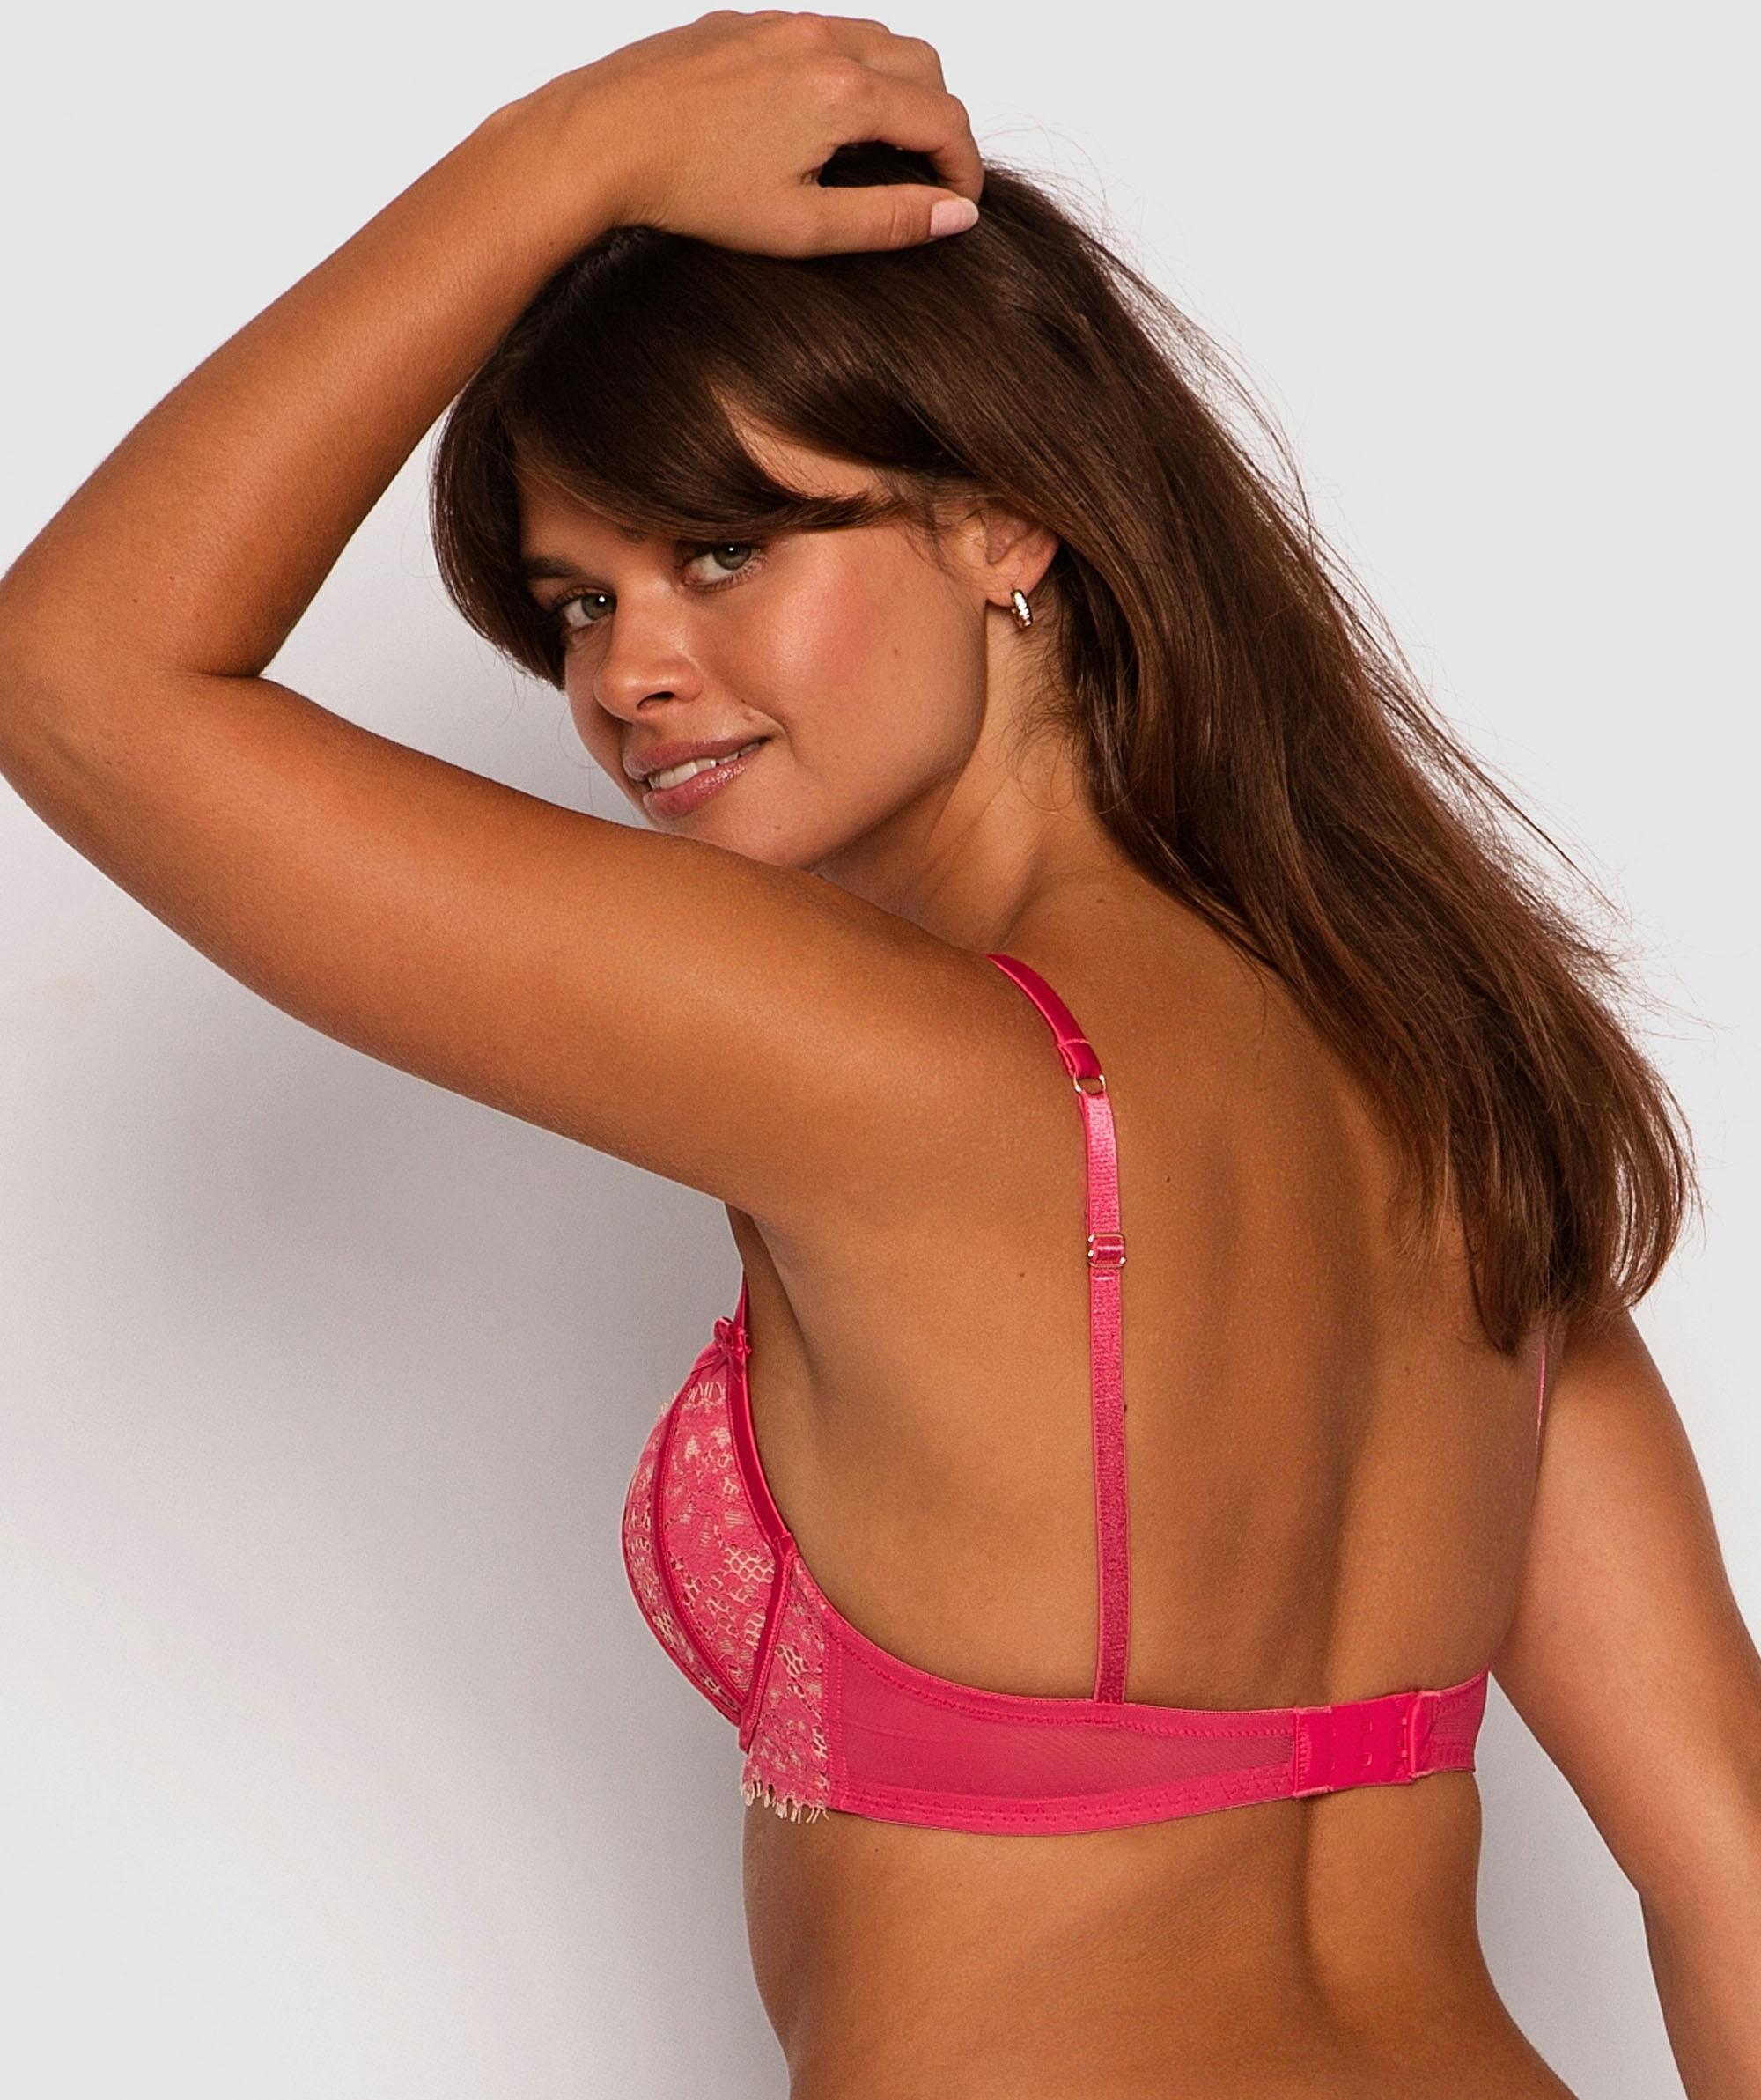 Karina Push Up Bra - Dark Pink/Nude